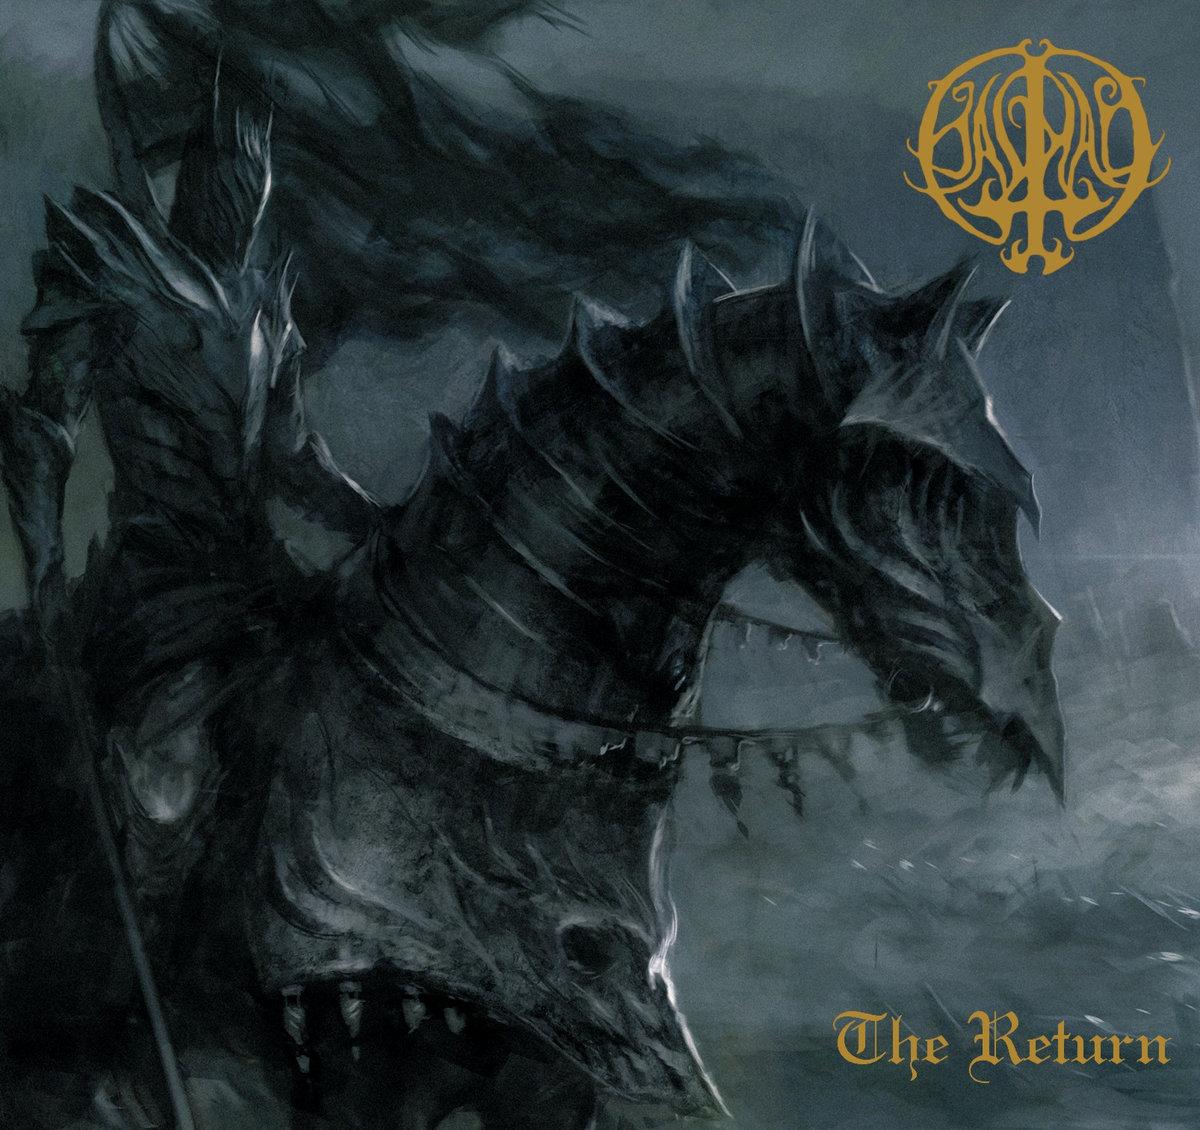 Haimad – The Return (EP)